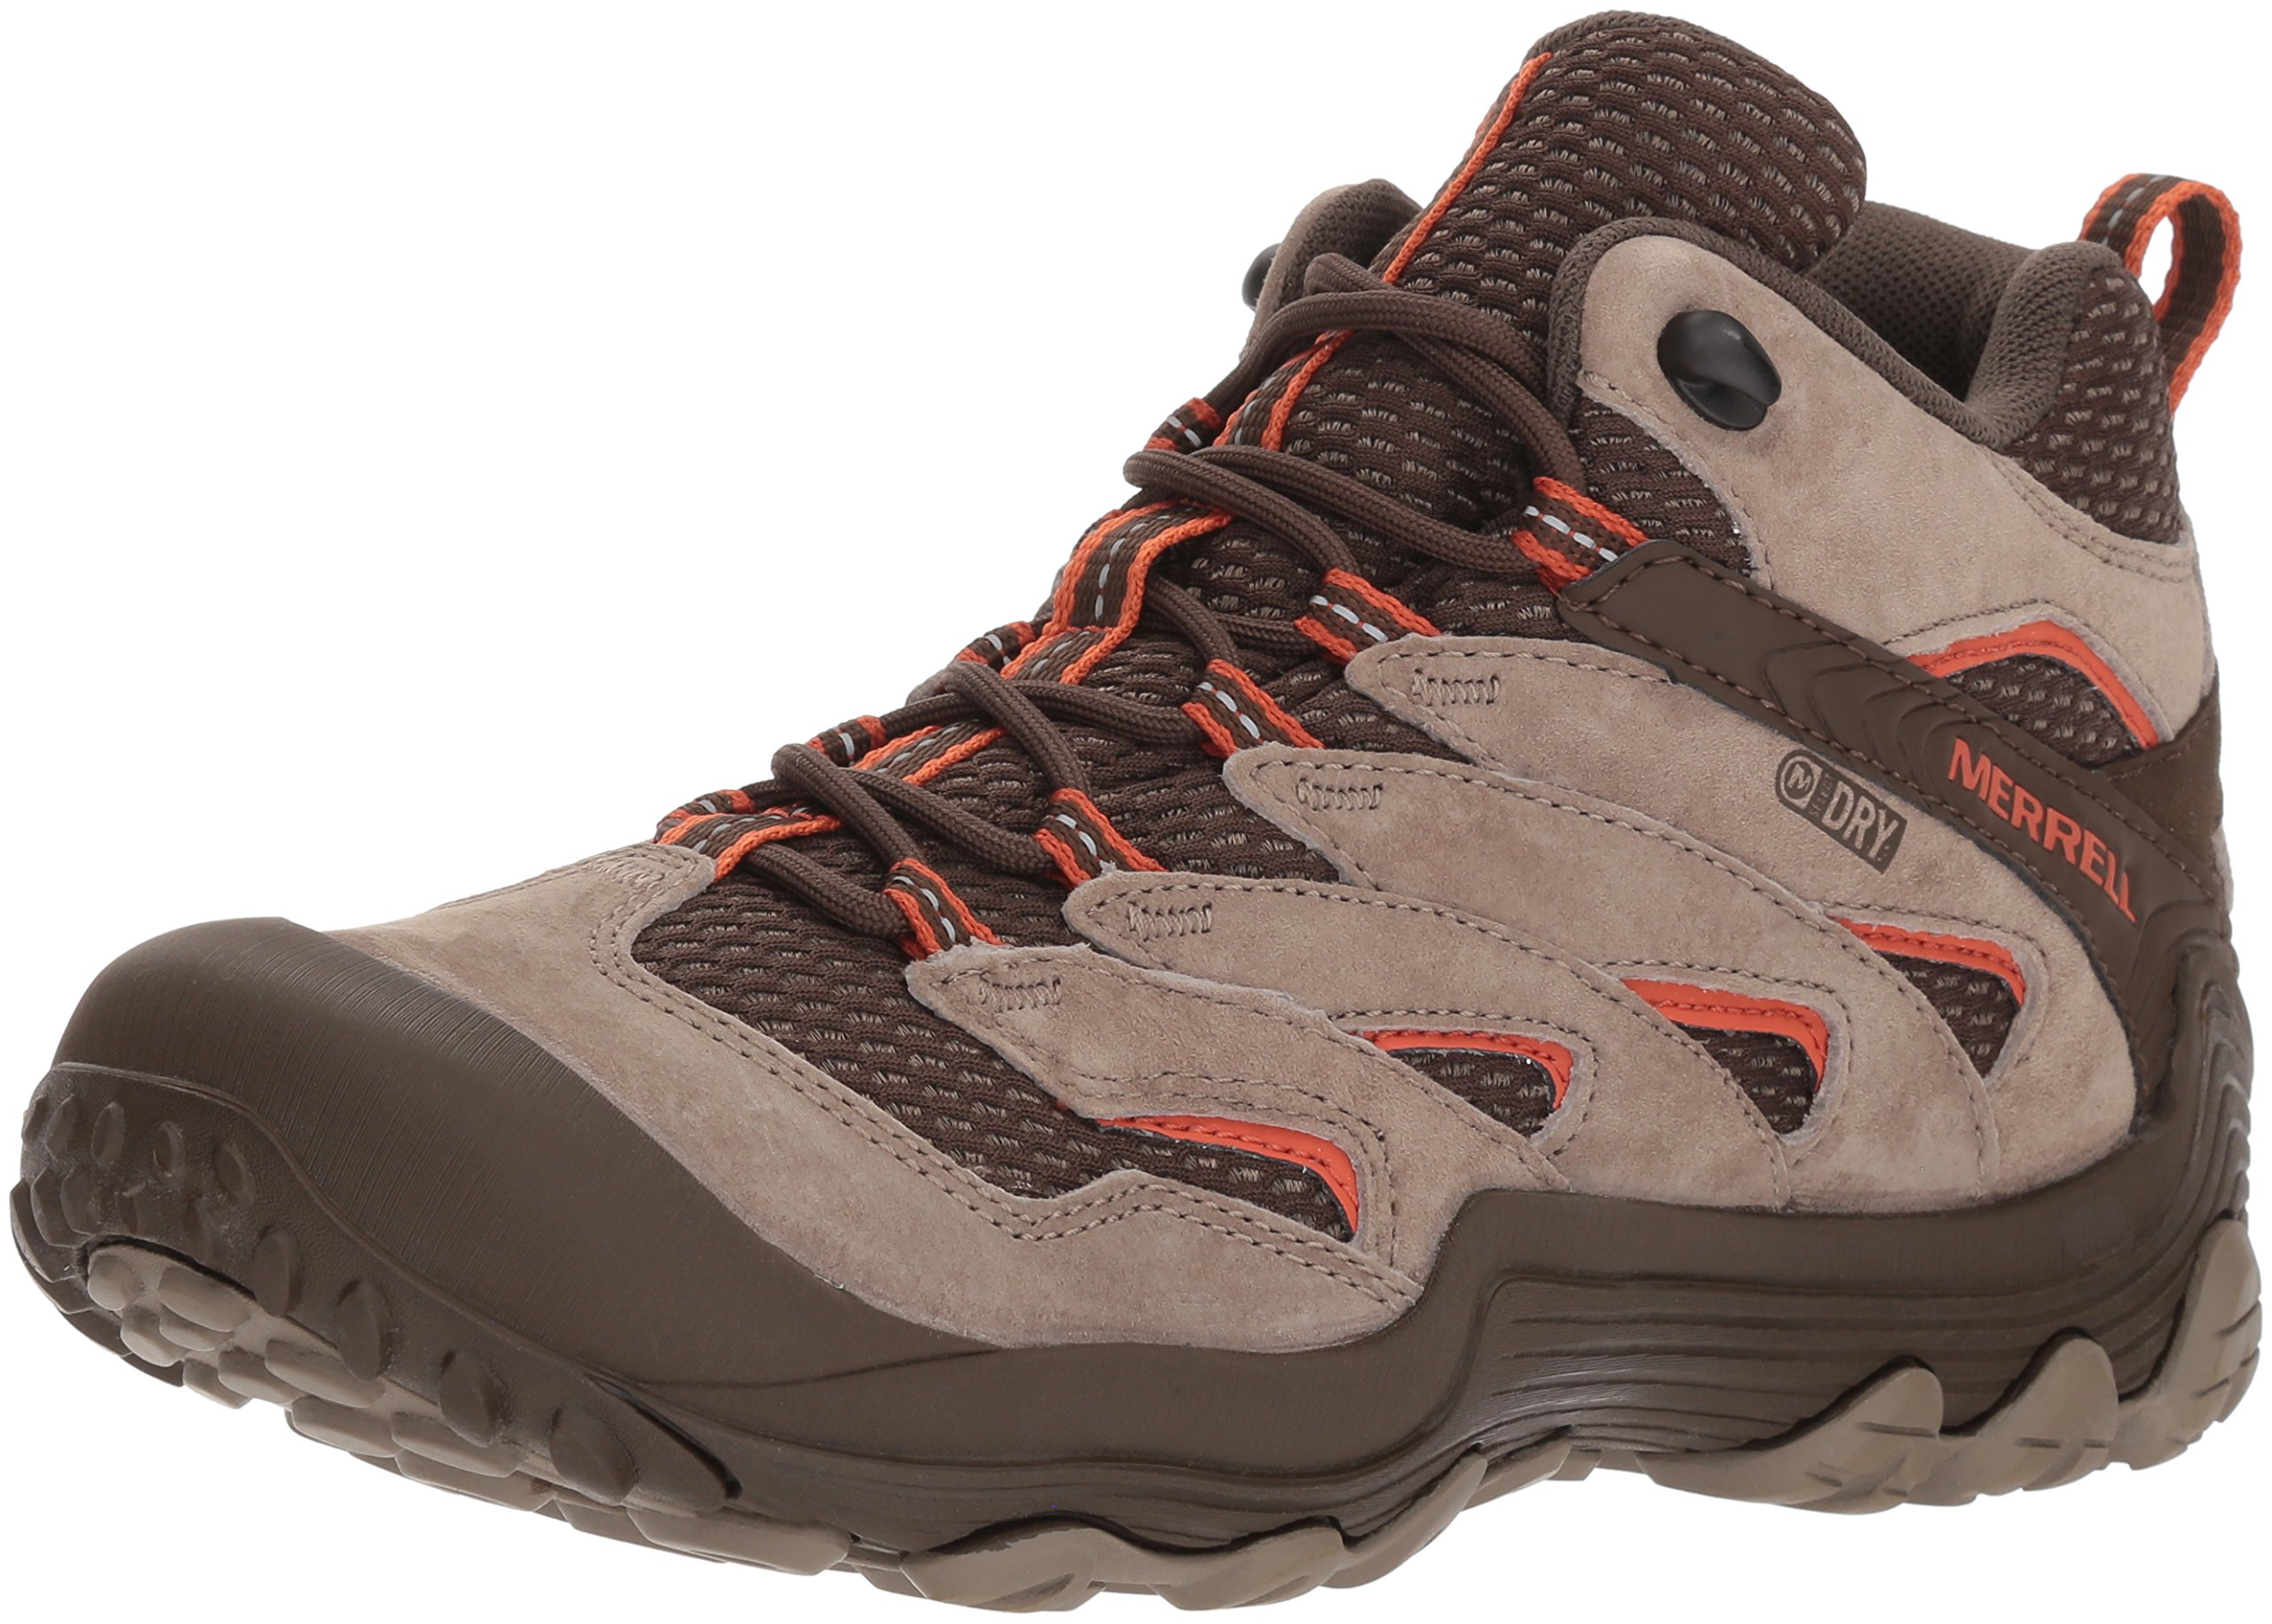 Merrell Women's Chameleon 7 Limit Mid Waterproof Hiking Boot, Brindle, 9.5 Medium US